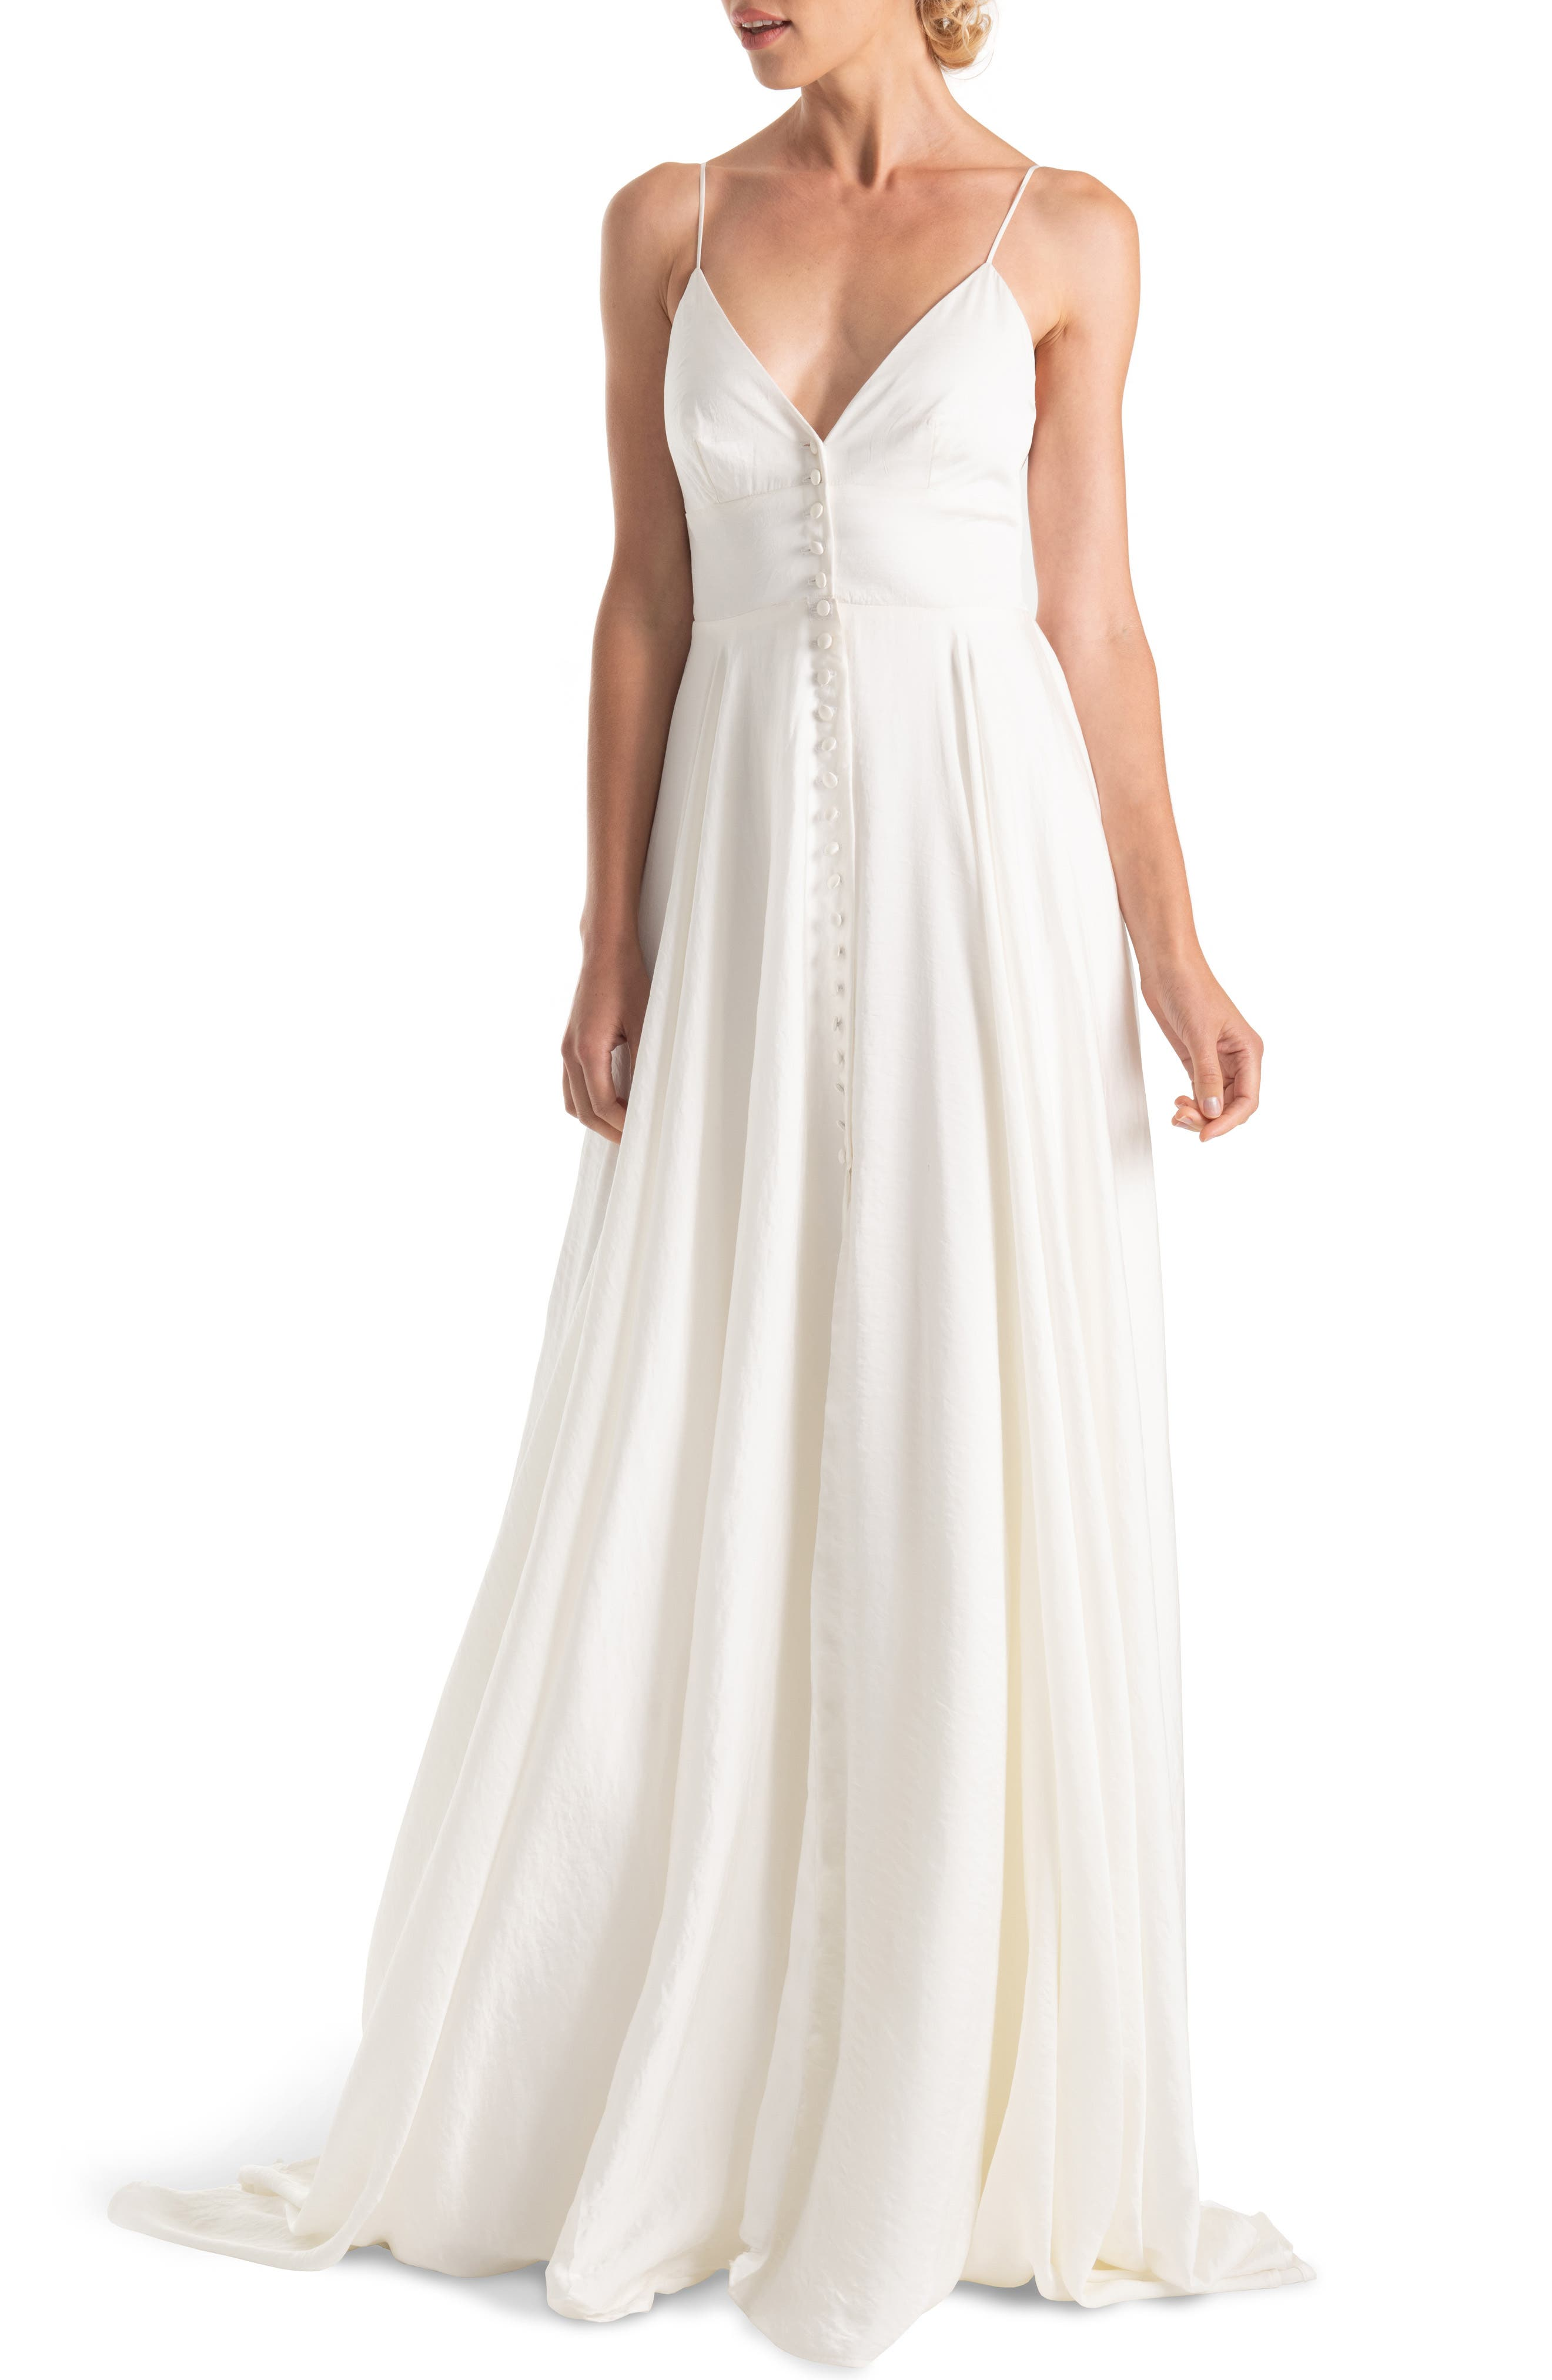 JOANNA AUGUST, Nancy V-Neck Crepe Wedding Dress, Main thumbnail 1, color, WHITE